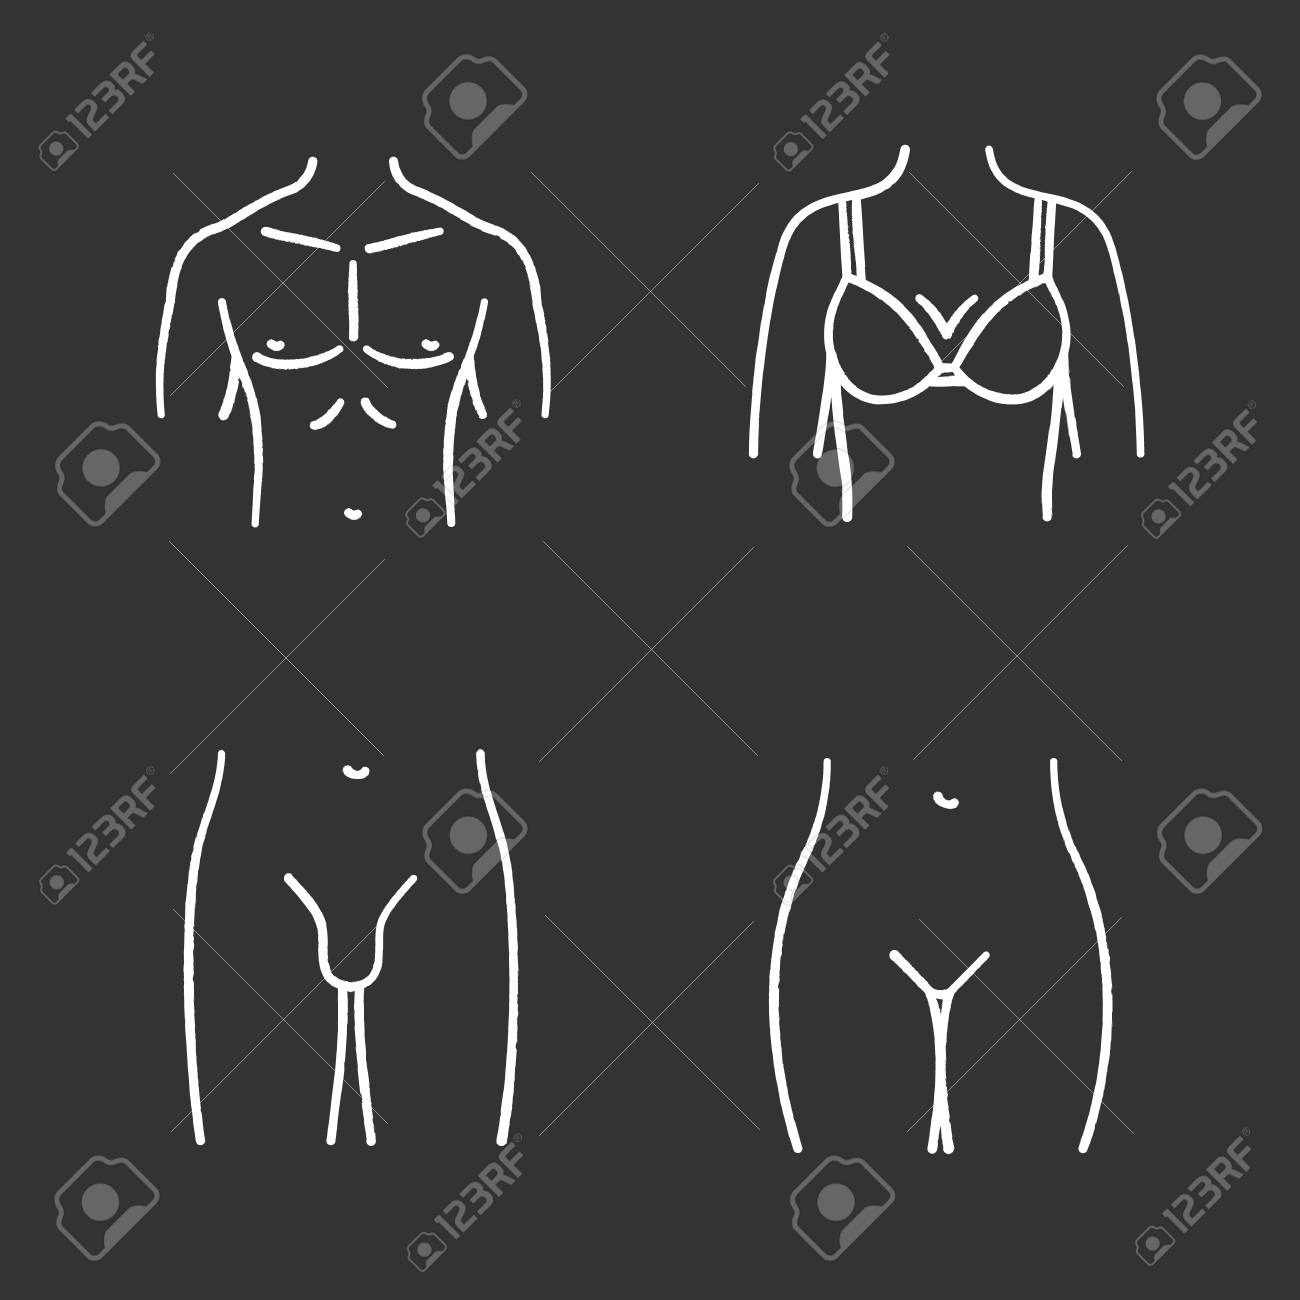 hight resolution of human body parts chalk icons set muscular man s chest female breast bikini zone